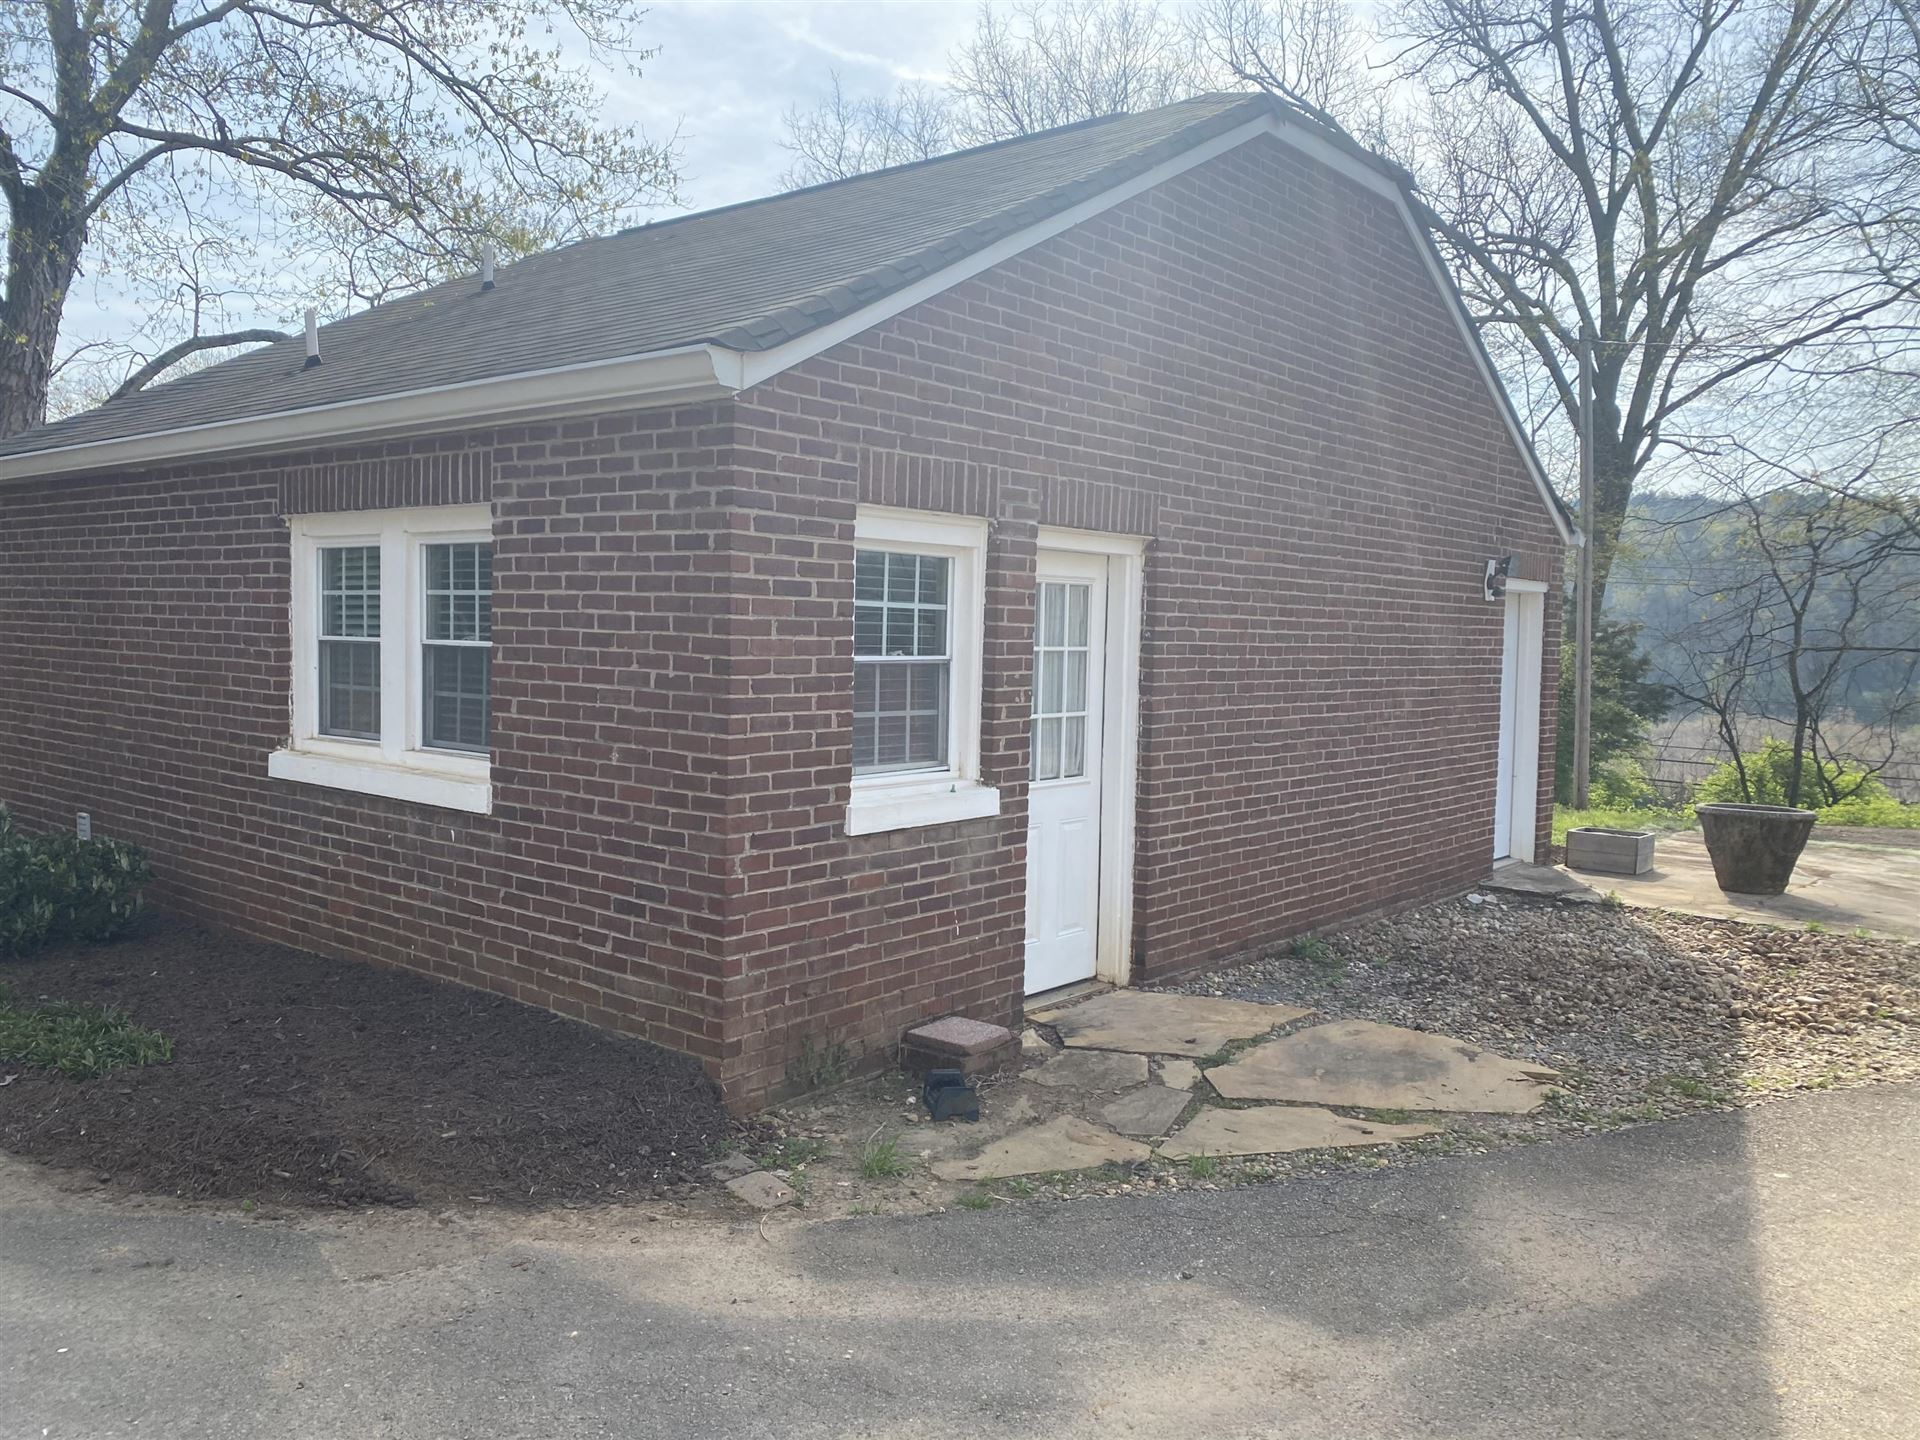 Photo of 17887 Martel Rd, Lenoir City, TN 37772 (MLS # 1148321)